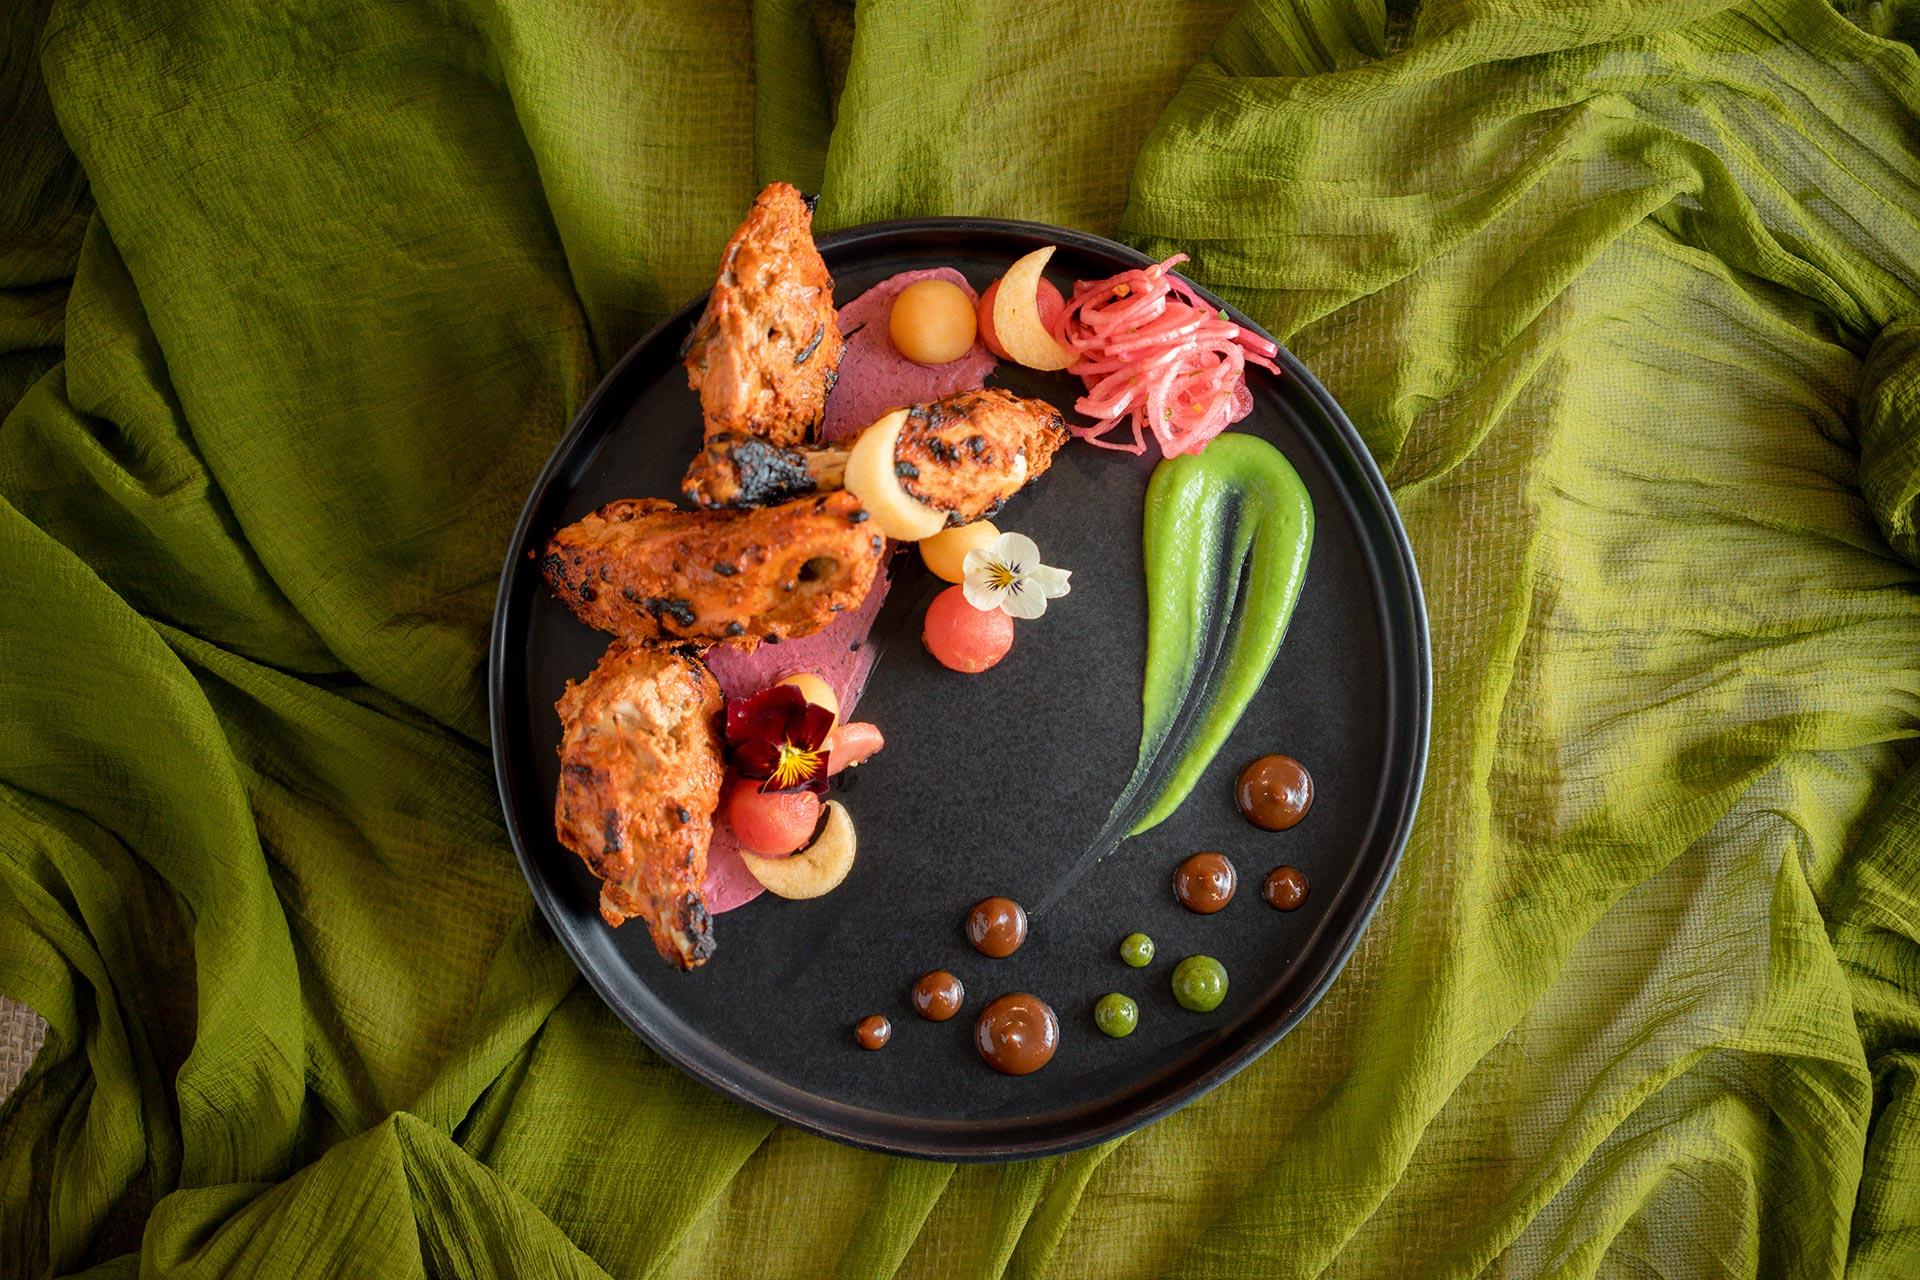 san-francisco-restaurant-food-photographer-a-few-good-clicks-net-105-copy.jpg